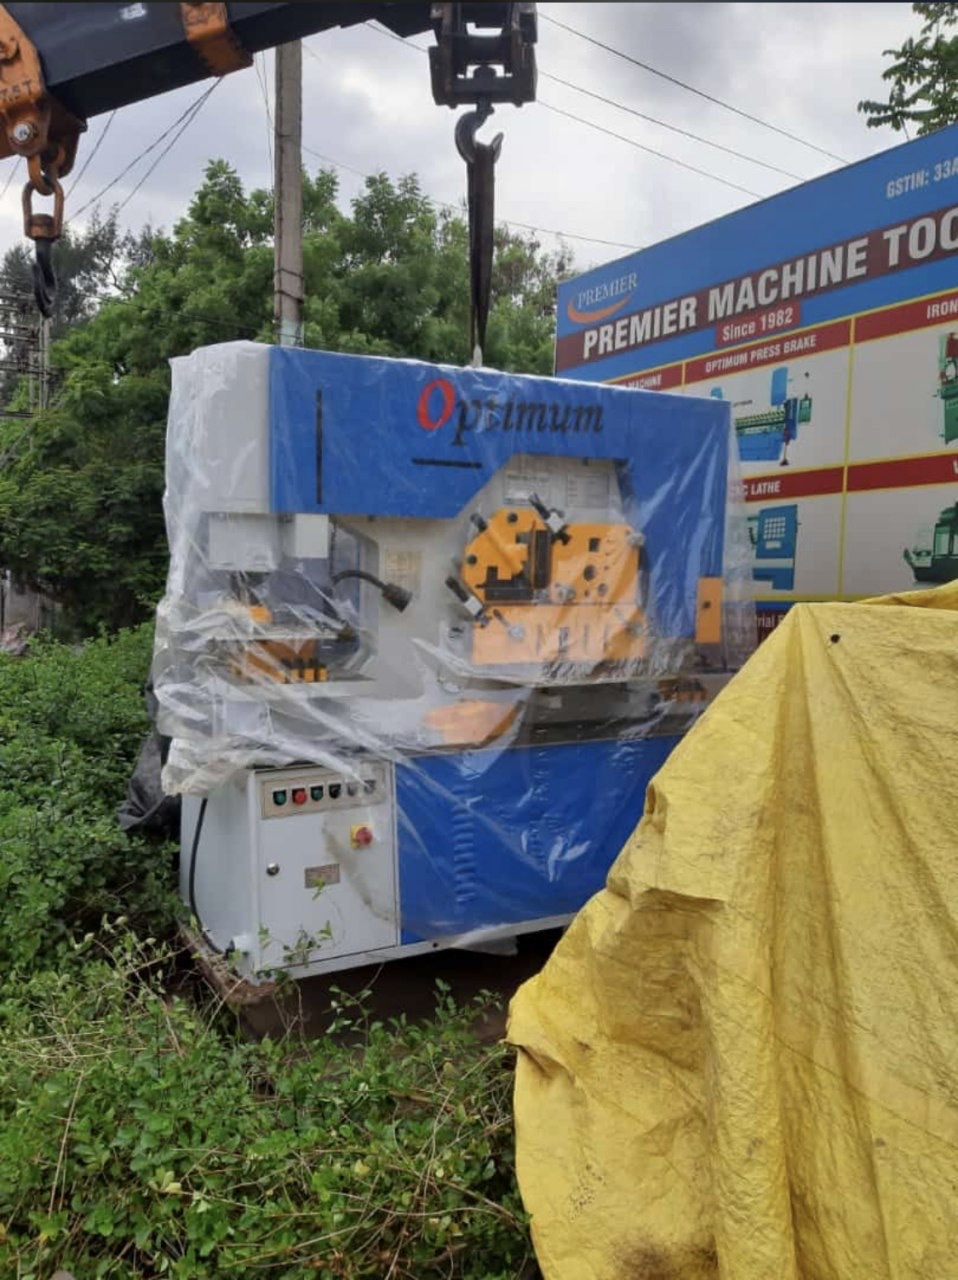 160T Hydraulic Punching Machine